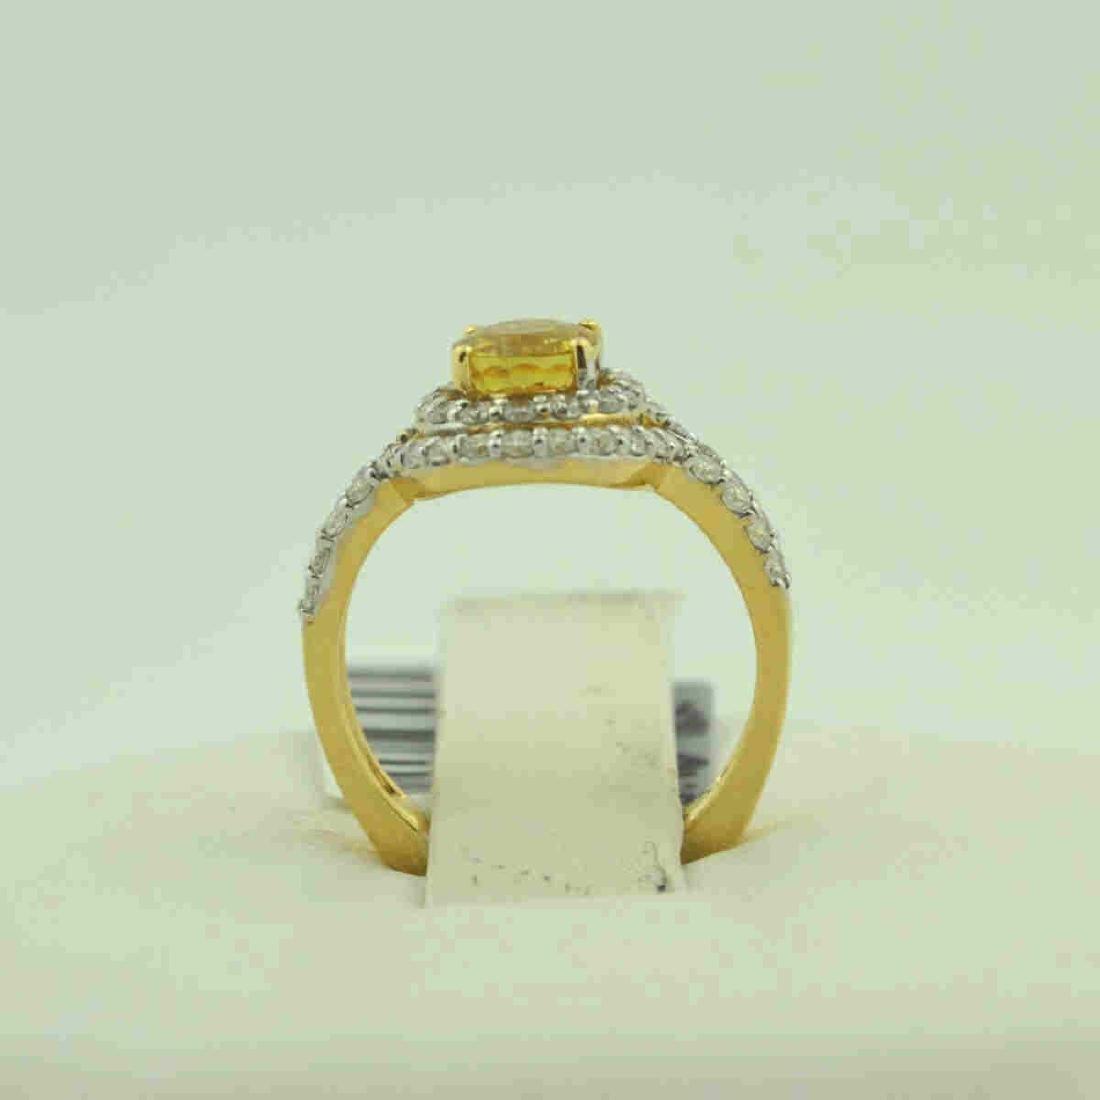 18kt yellow gold yellow sapphire ring - 3